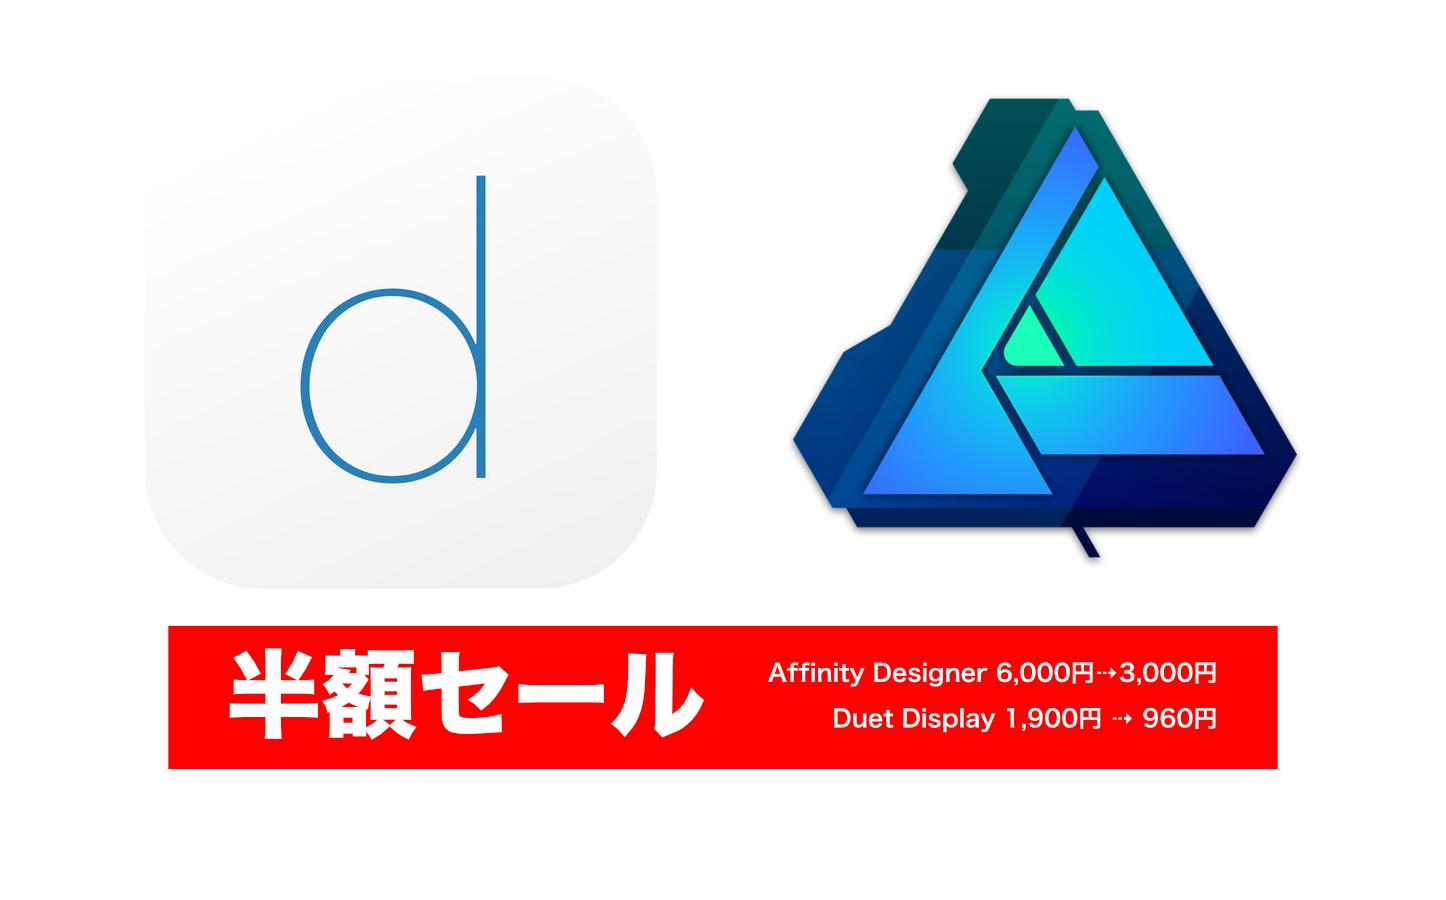 DuetDisplay Affinity Designer